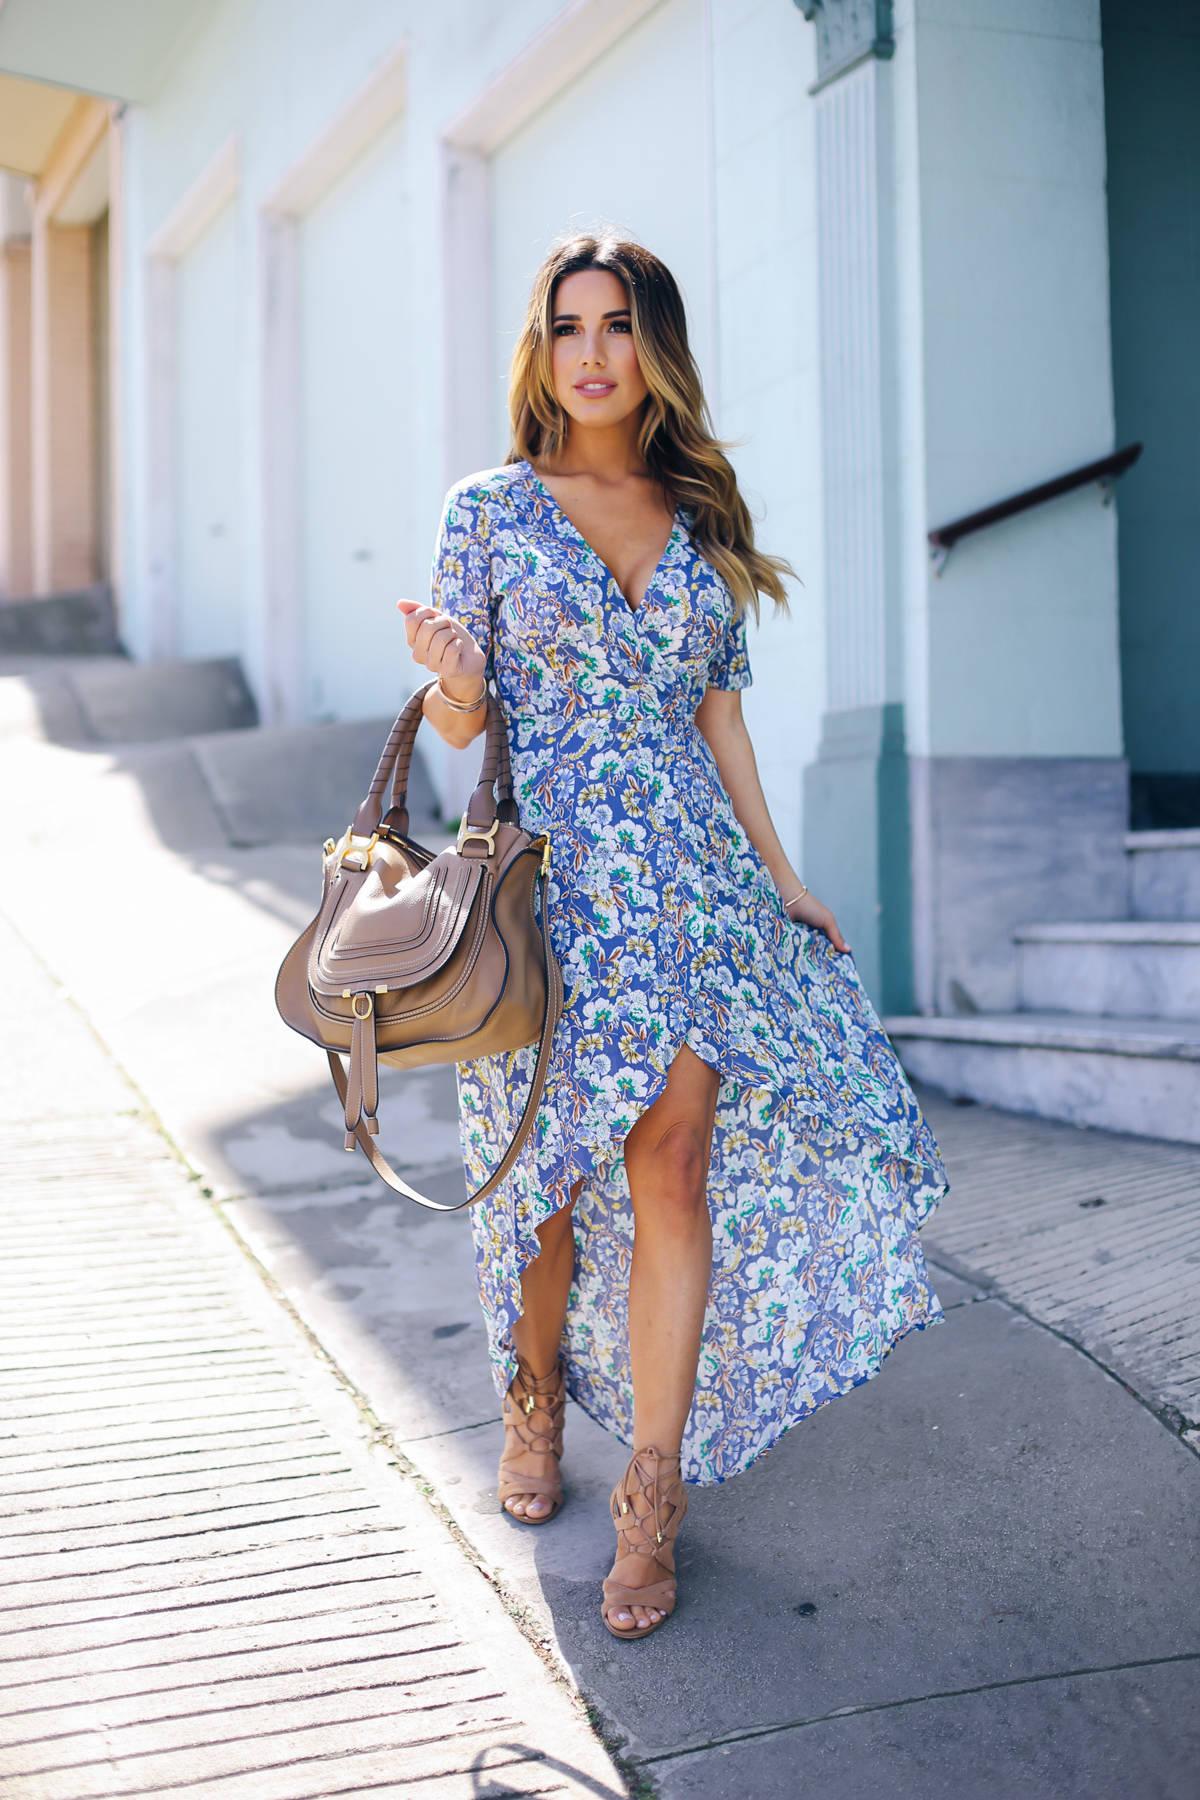 Ariana-Lauren-FashionBorn-ASTR-Nordstrom-Maxi-Dress-Spring-Looks-RyanbyRyanChua-2676